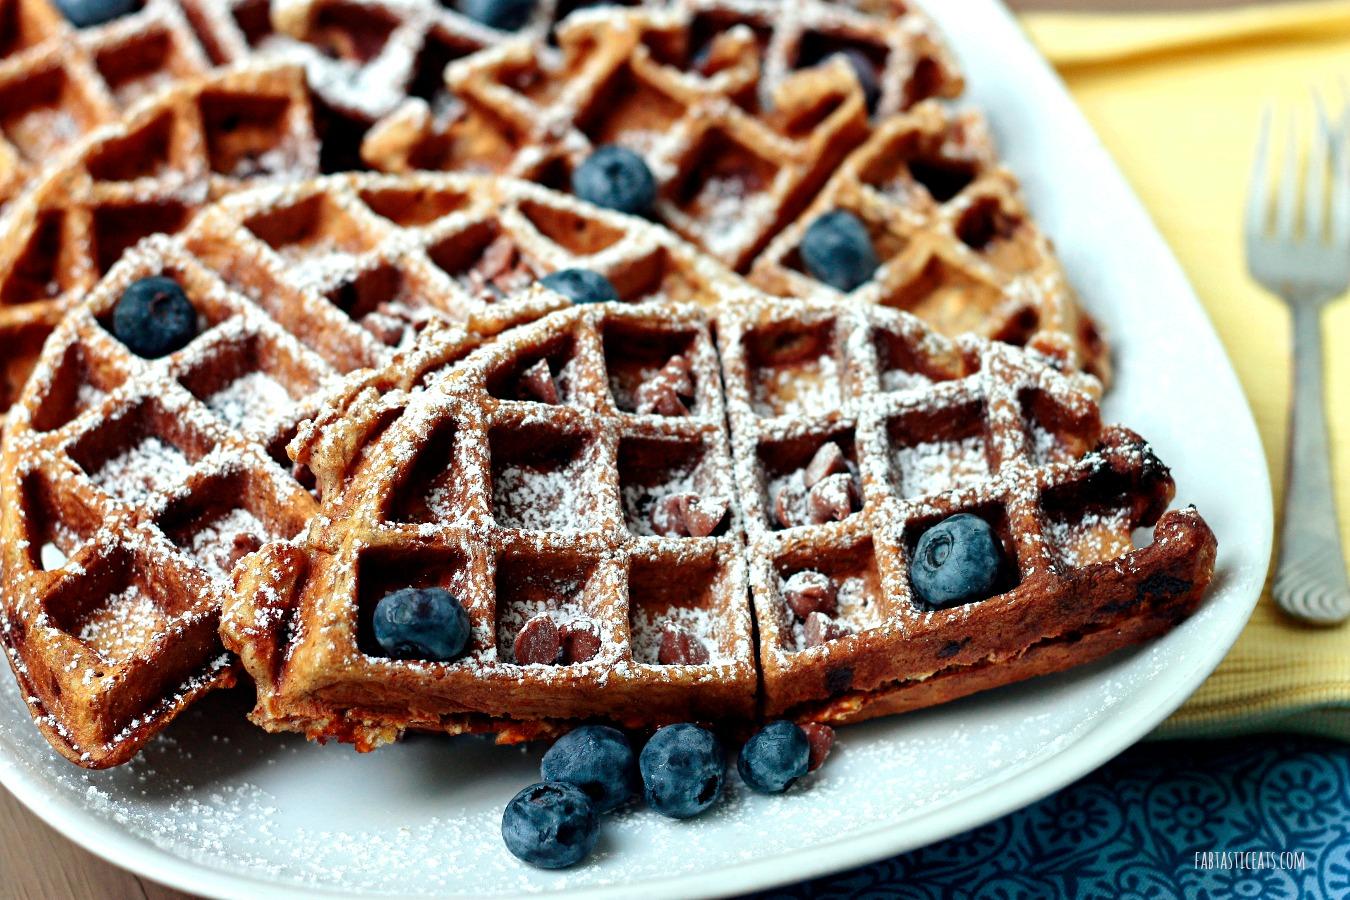 Cinnamon Chip Waffles | Fabtastic Eats